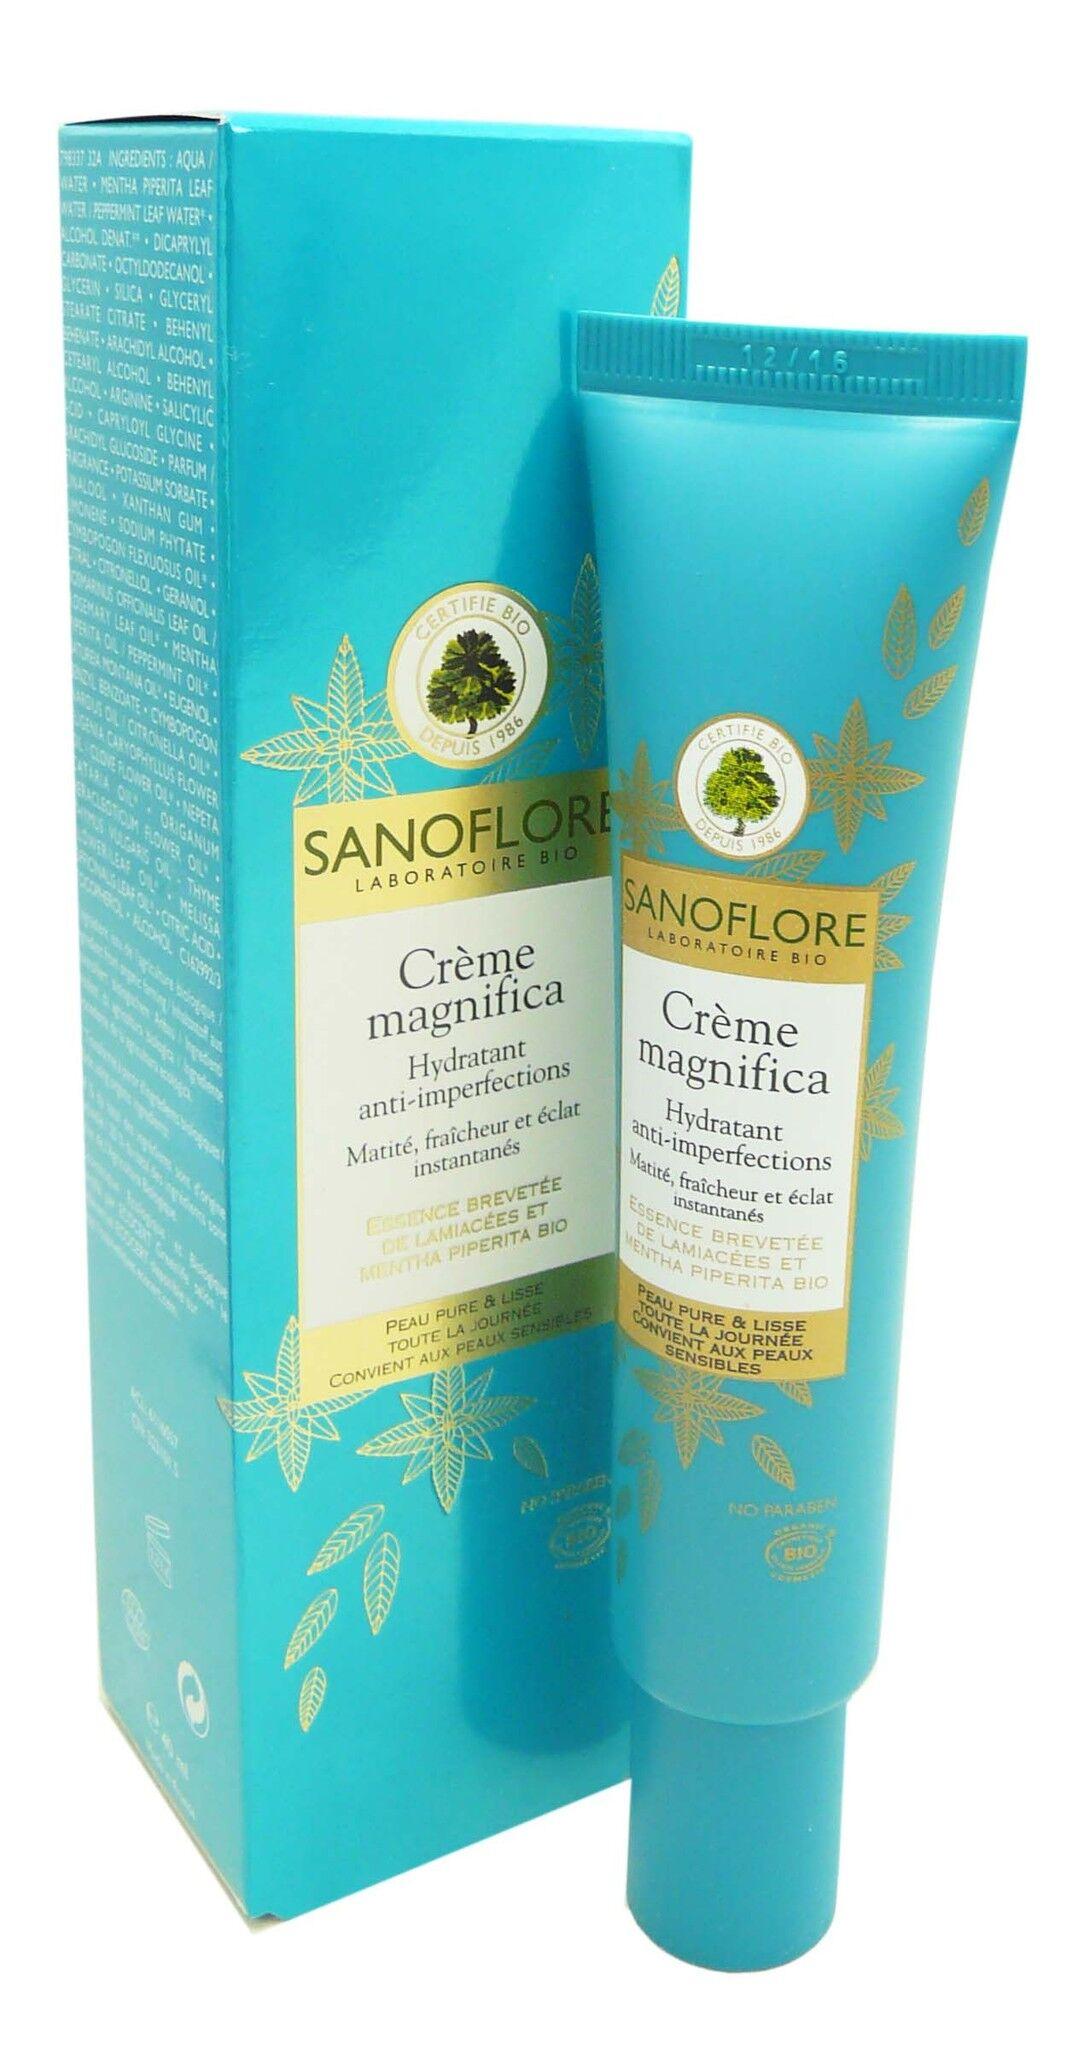 Sanoflore creme magnifica hydratant 40ml